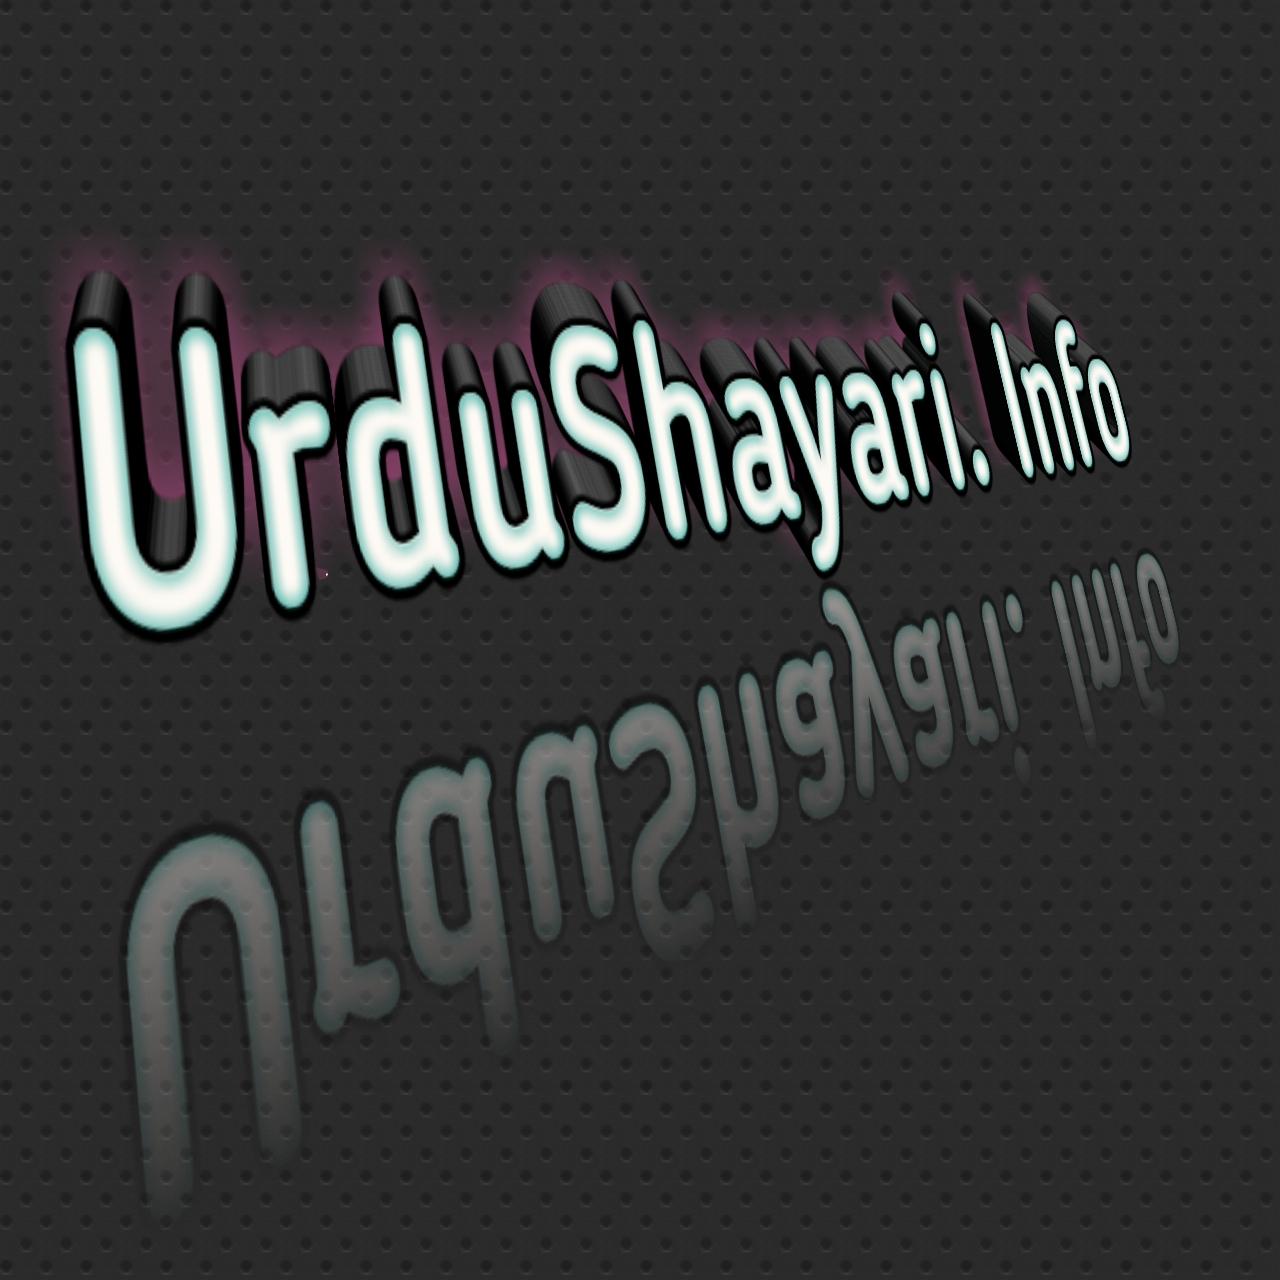 urdushayari blog best blog for 2 lines poetry